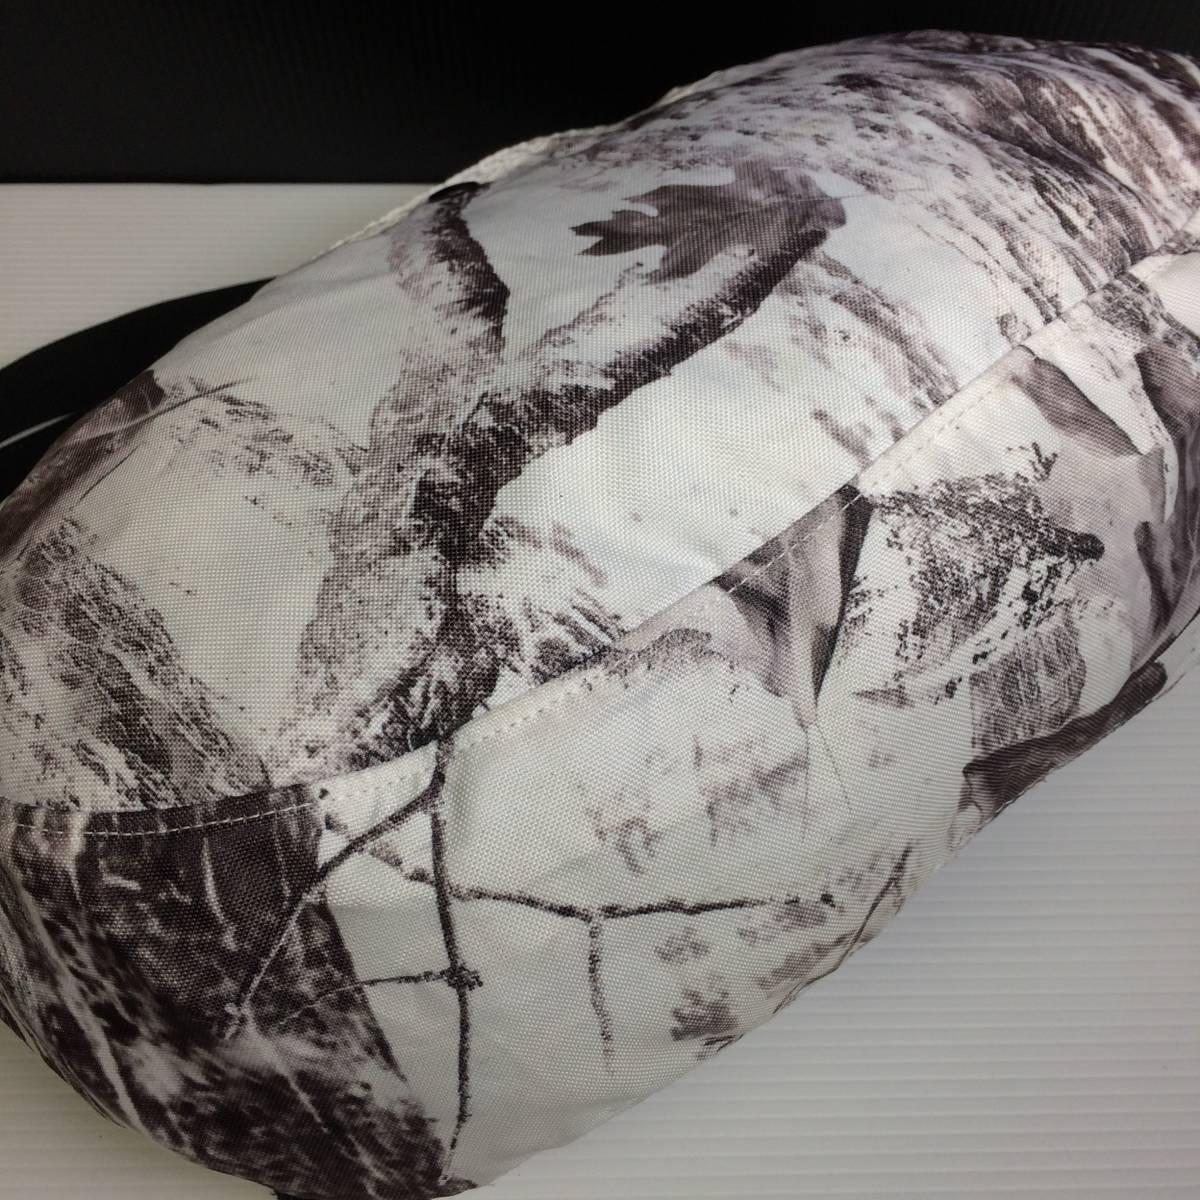 USA製 旧タグ グレゴリー サッチェルバッグ M GREGORY サッチェルM スノーカモ 迷彩 ショルダーバッグ 三日月